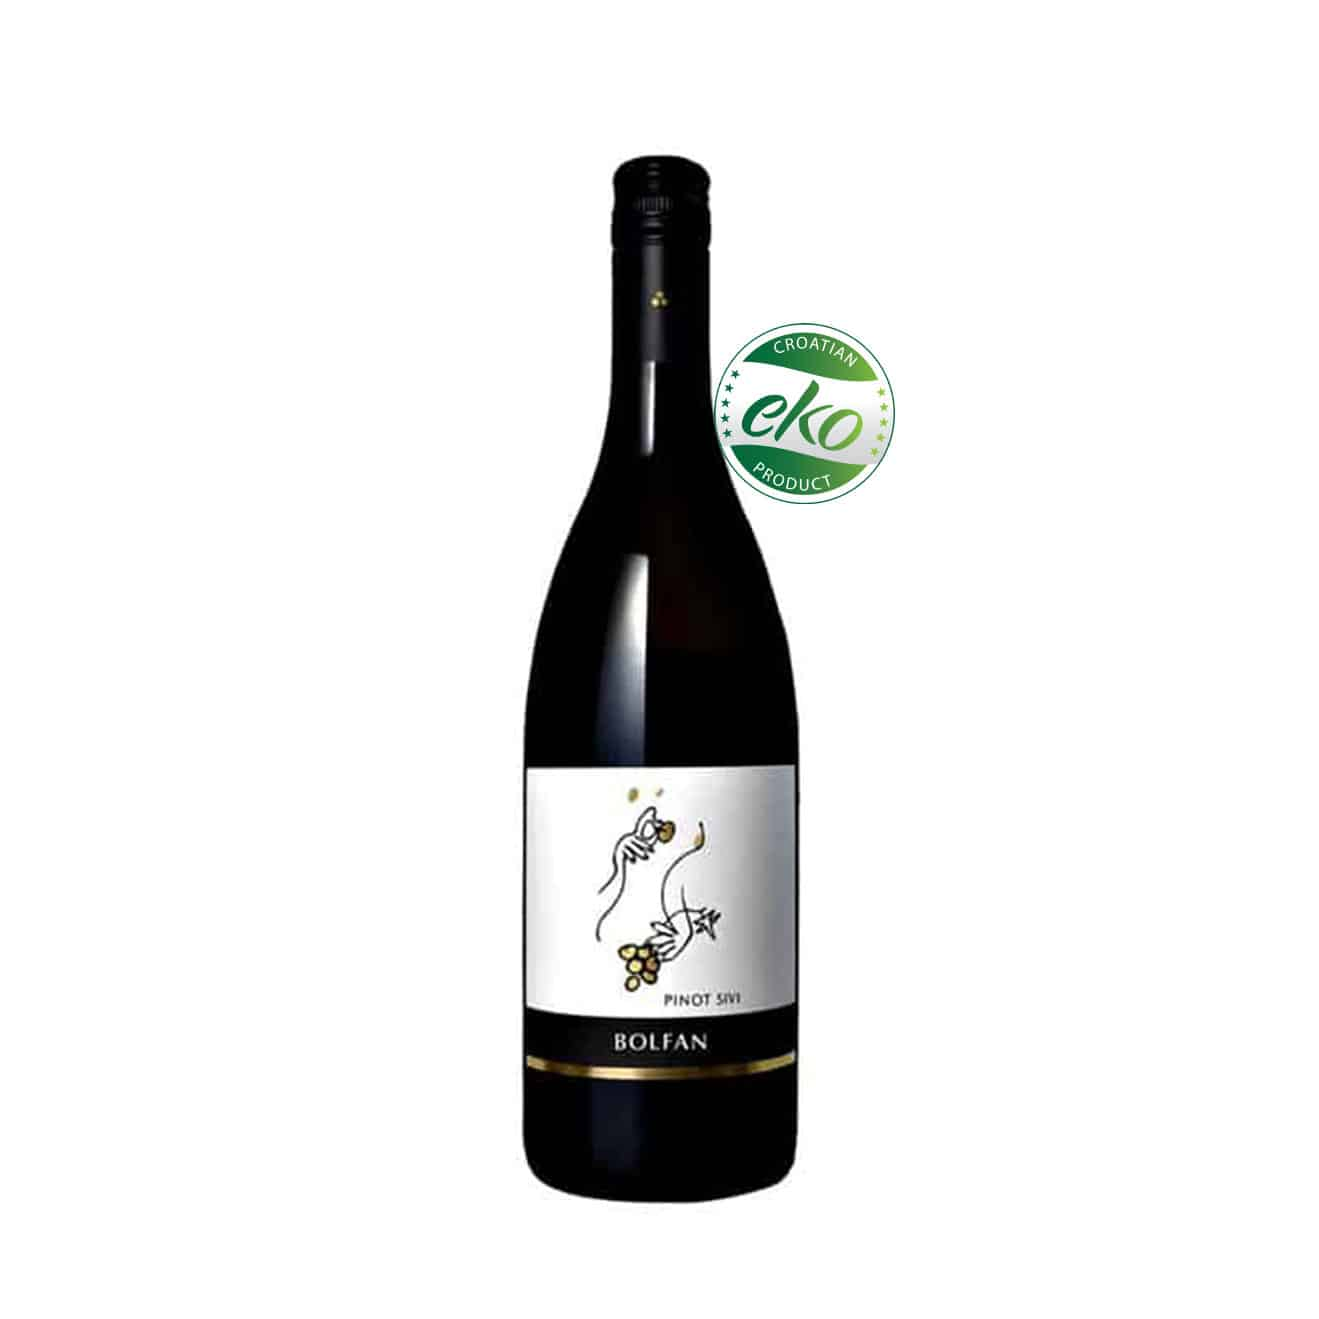 Bolfan Pinot Gris 2019